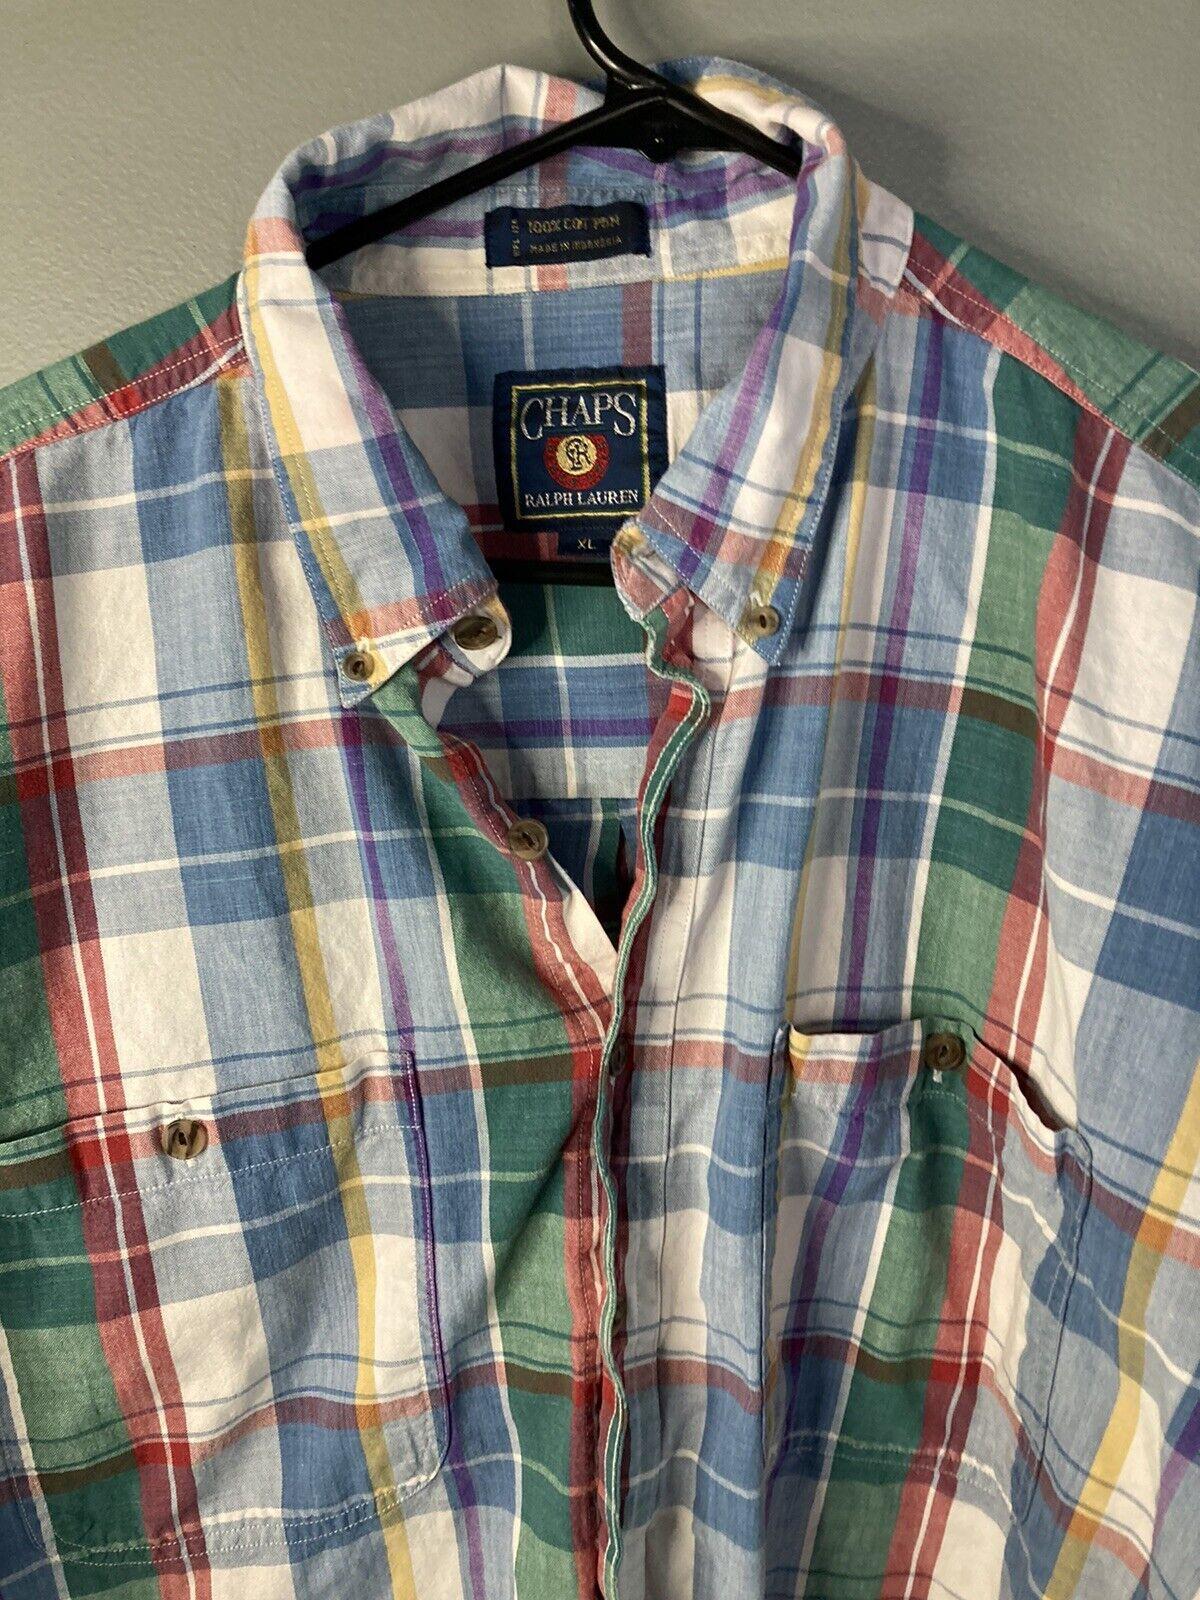 Vtg 80s 90s Chaps Ralph Lauren Mens XL Short Slee… - image 2